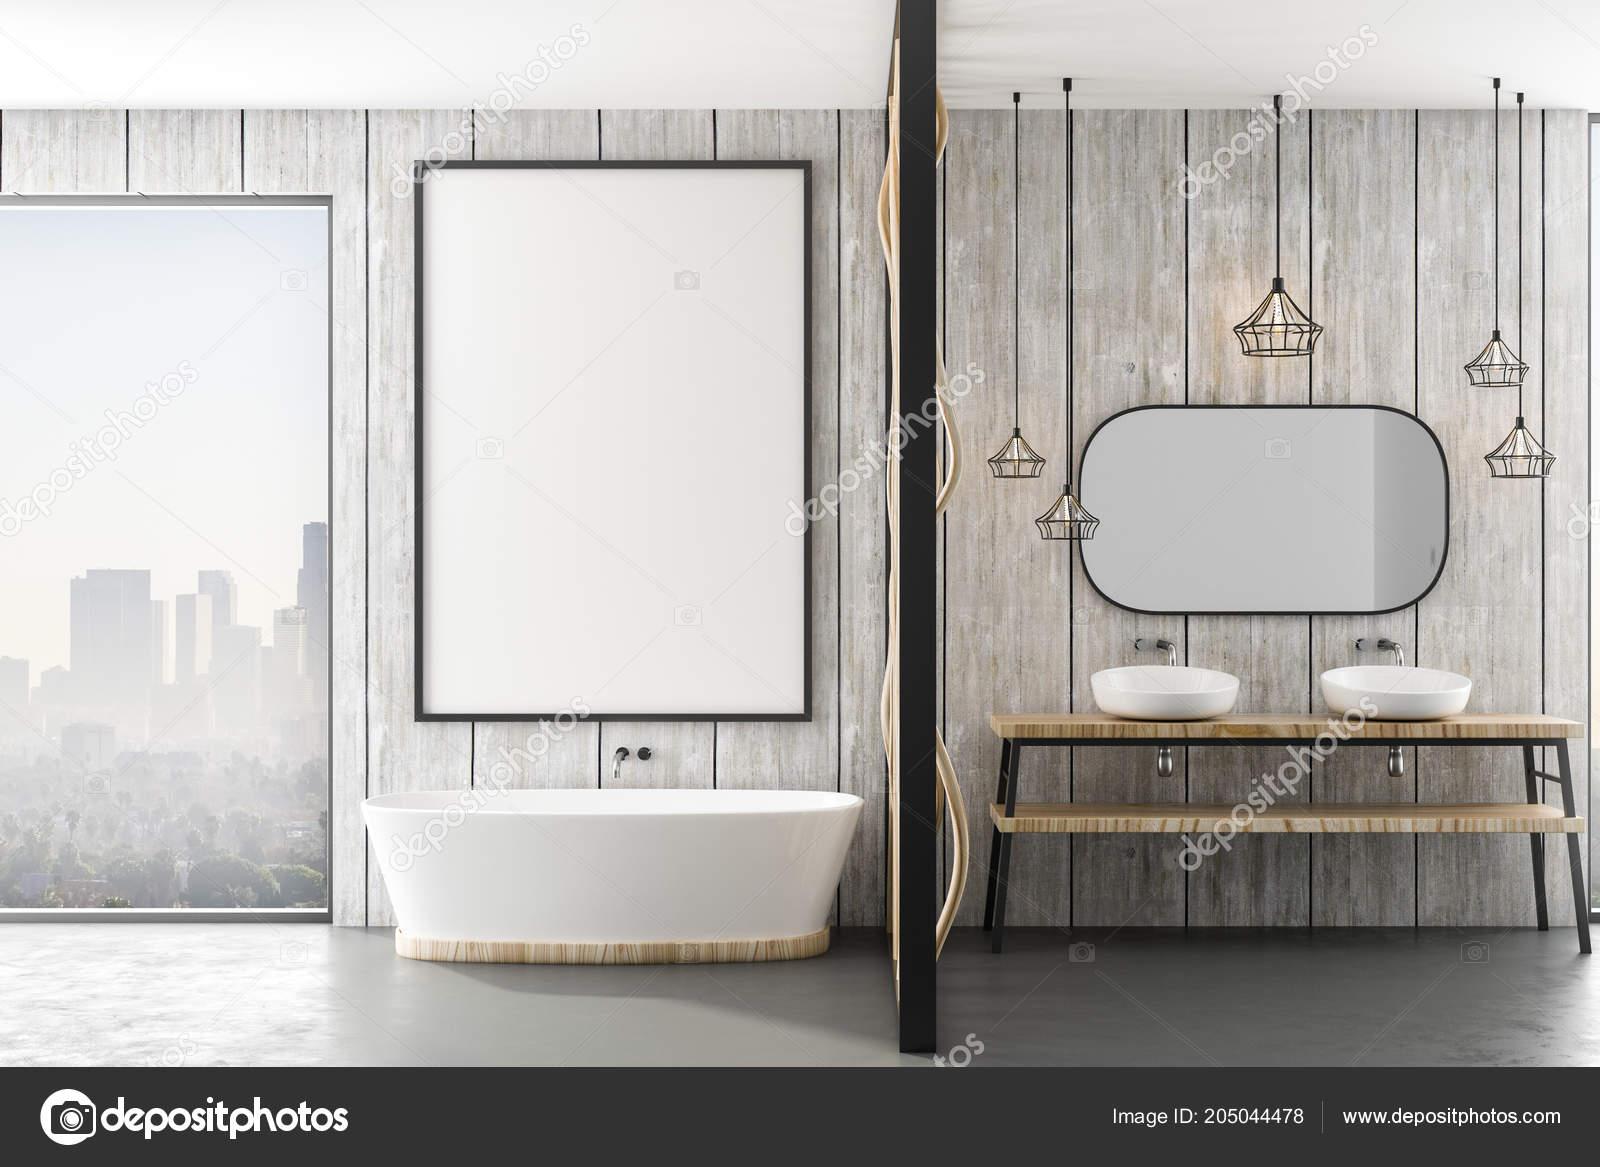 Mockup witte poster houten muur badkamer van moderne loft met